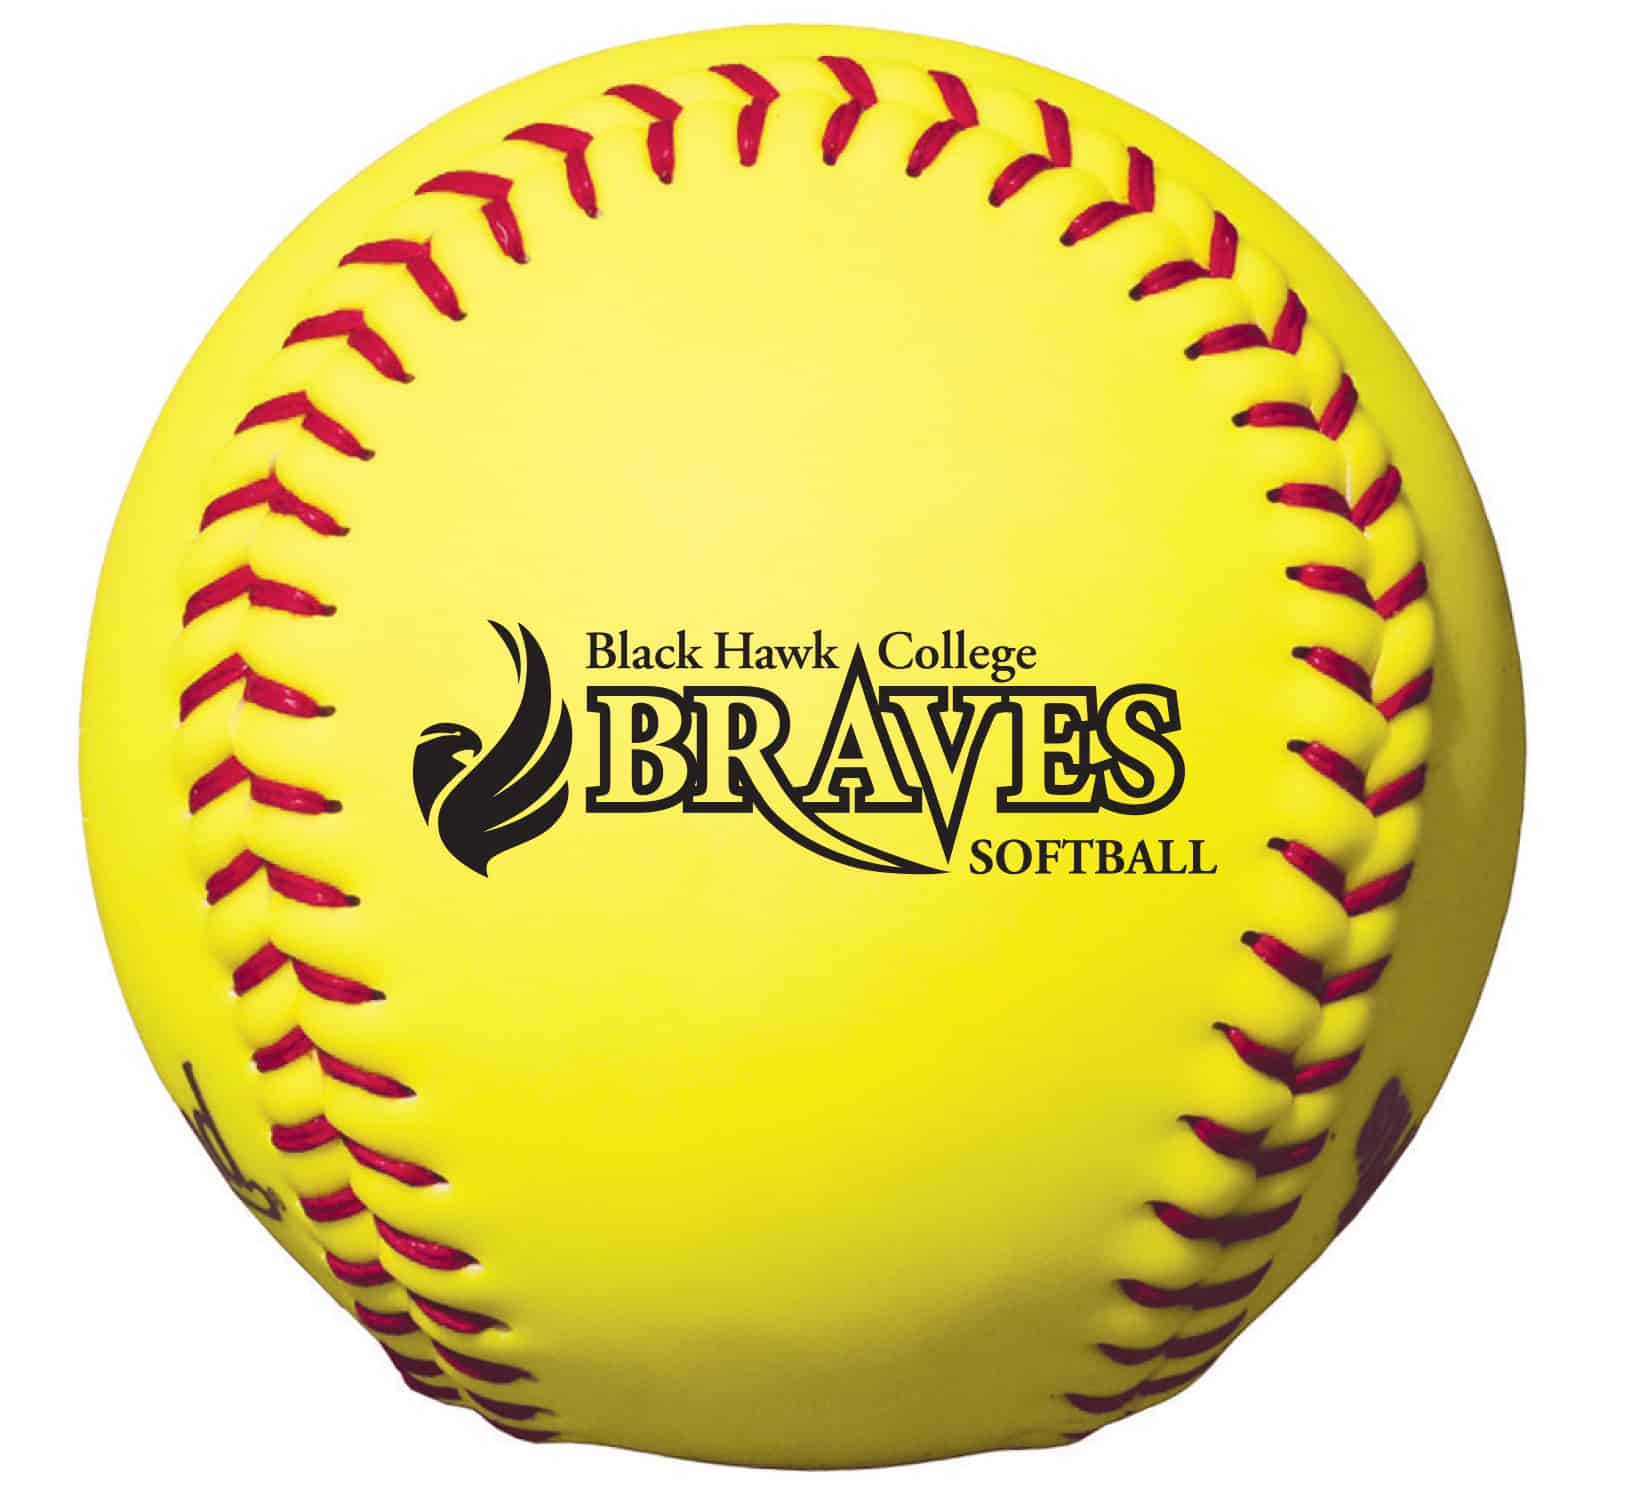 Braves Softball Logo